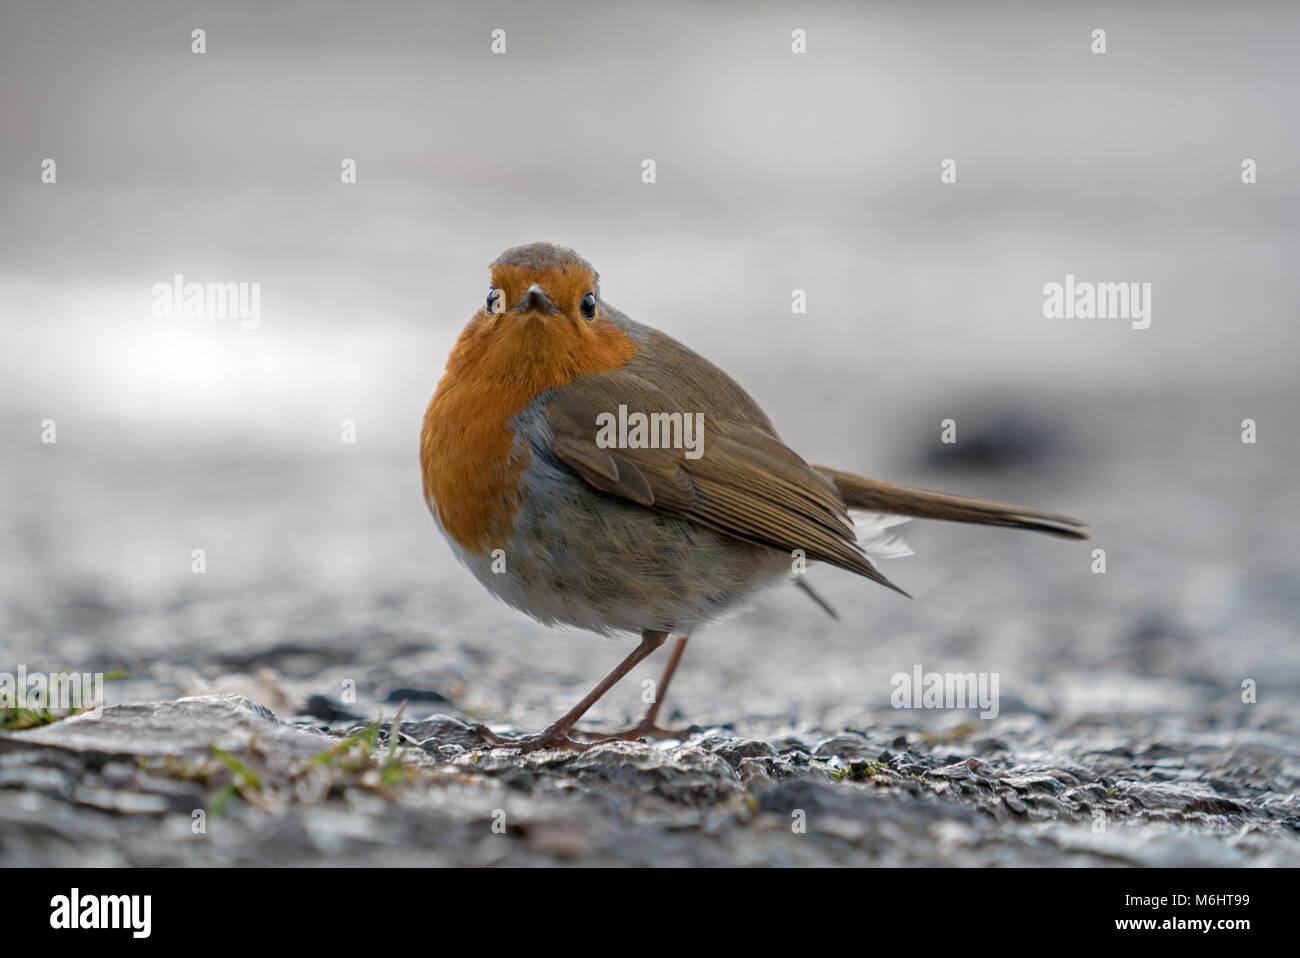 The European robin (Erithacus rubecula), robin redbreast, Erithacus rubecula, Passerine - Stock Image